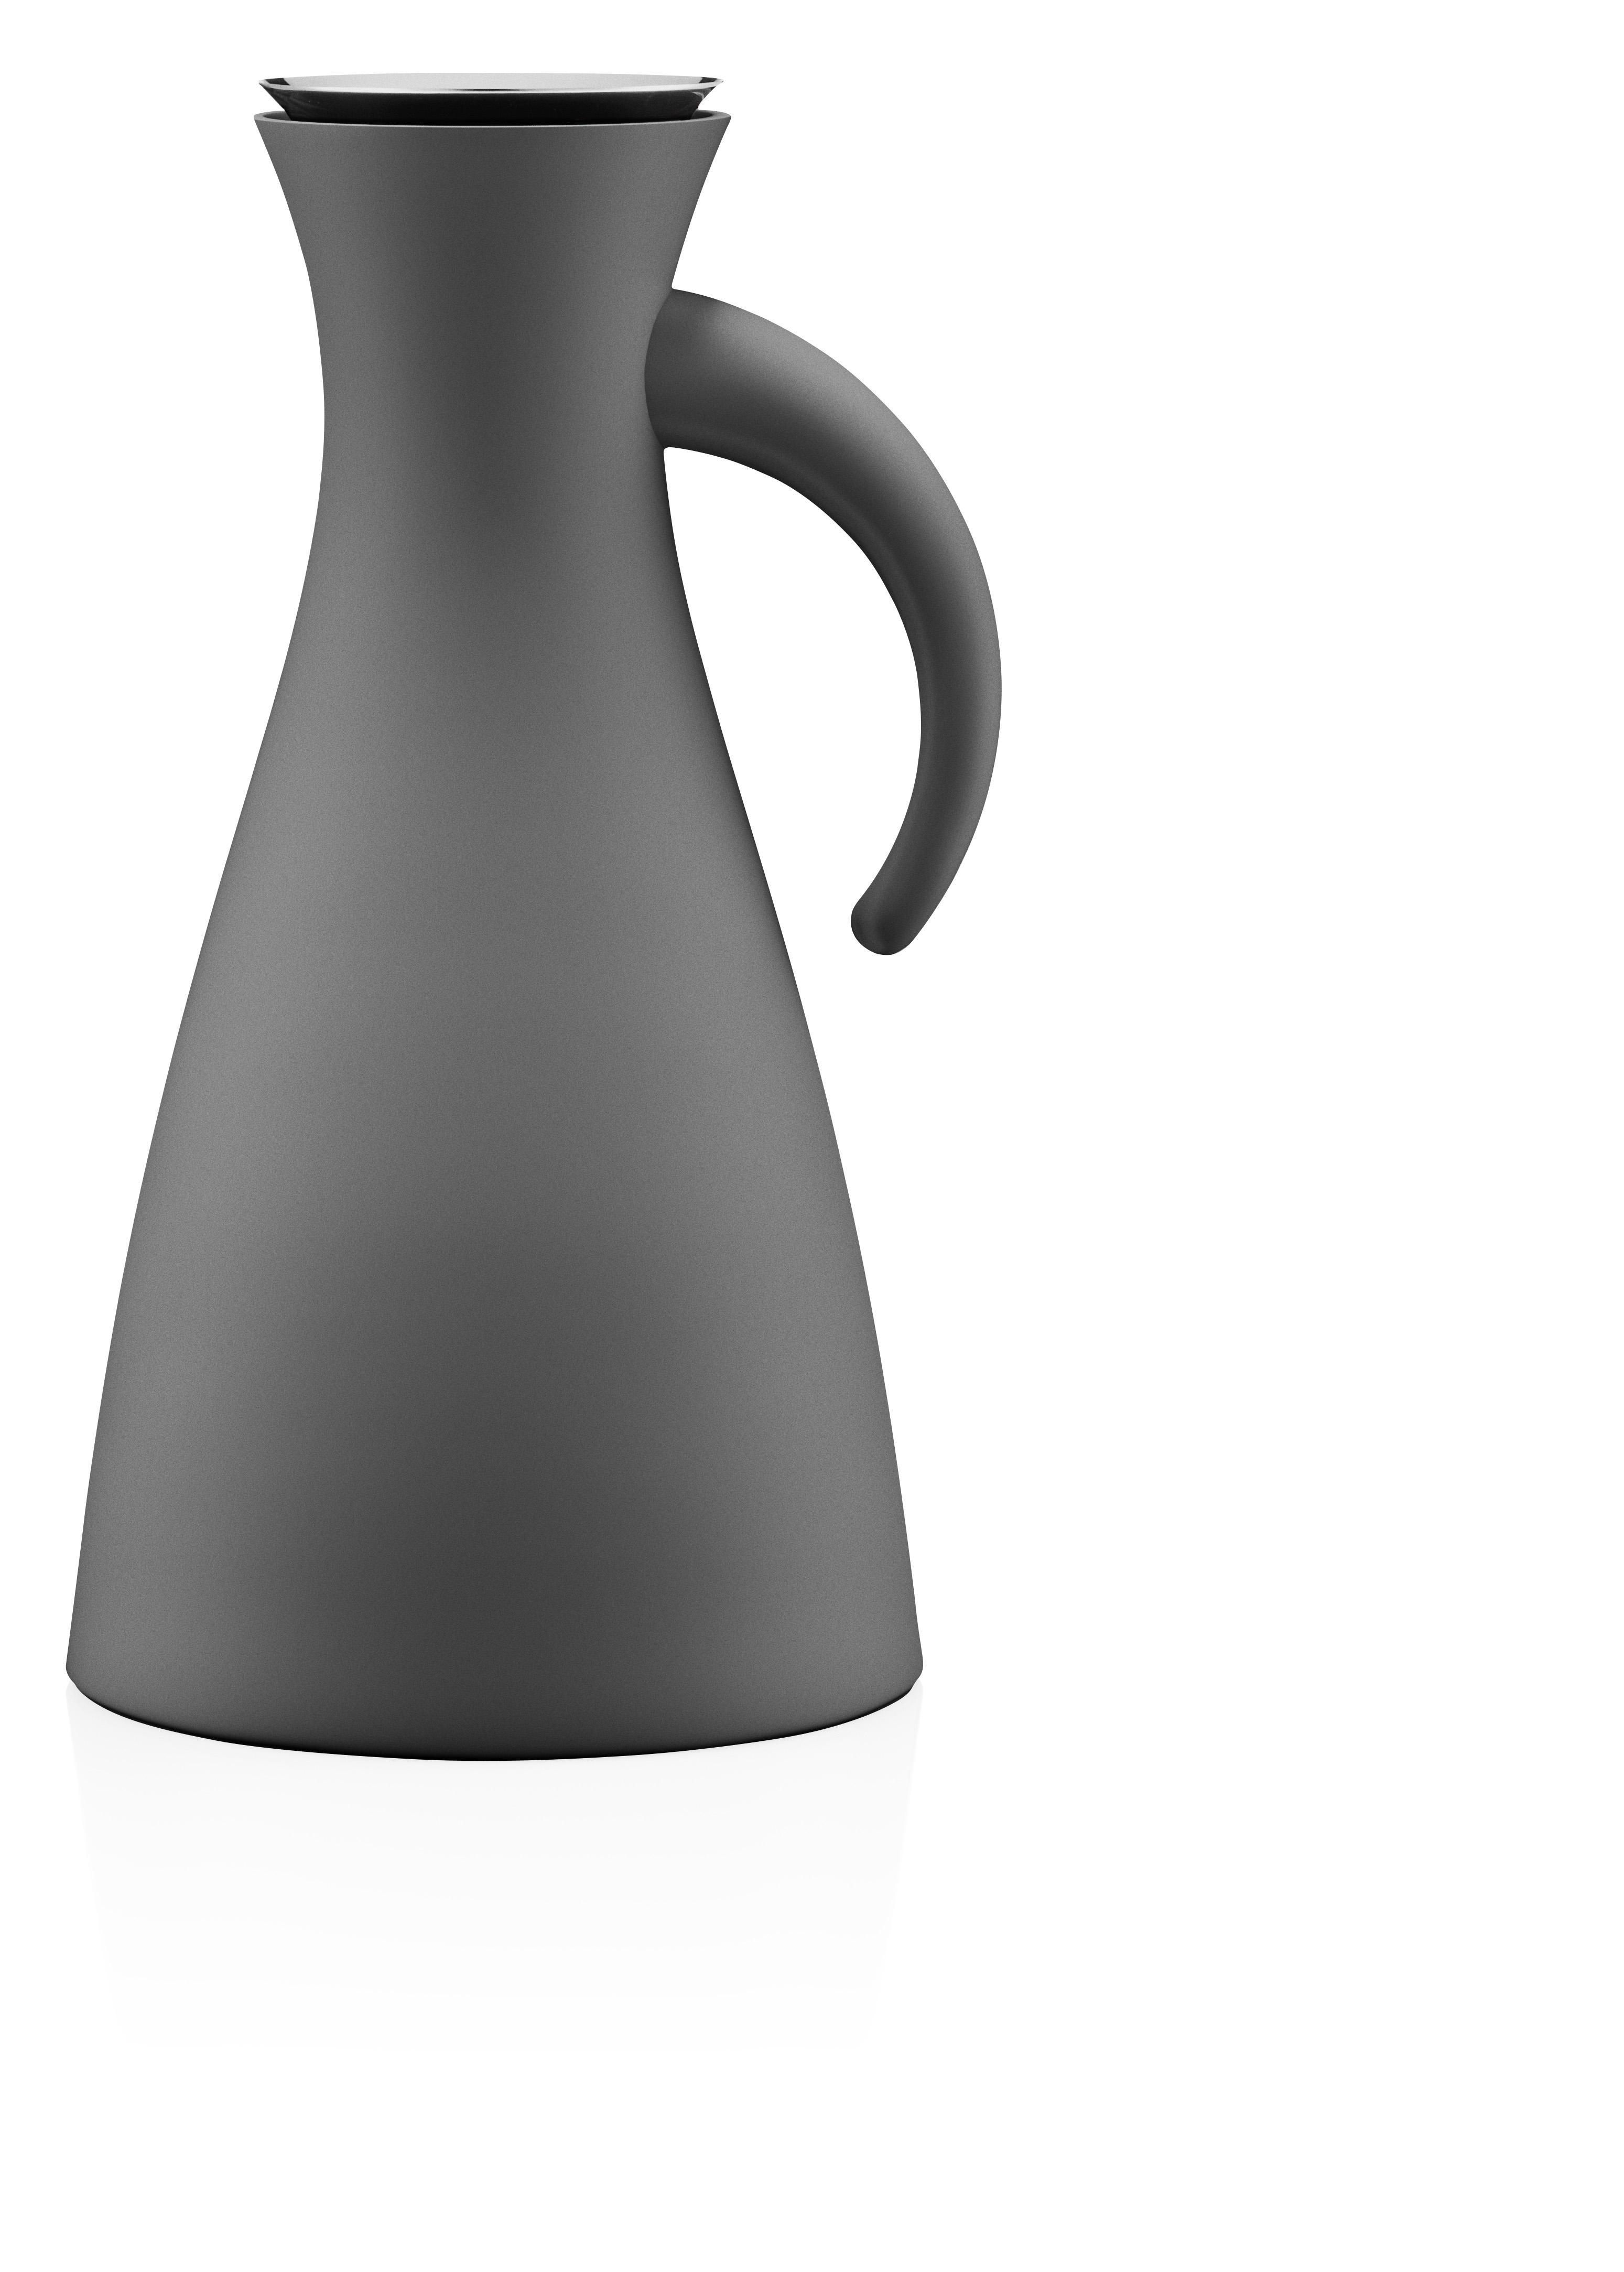 Eva Solo - Vacuum Jug - Matt Grey (502803)